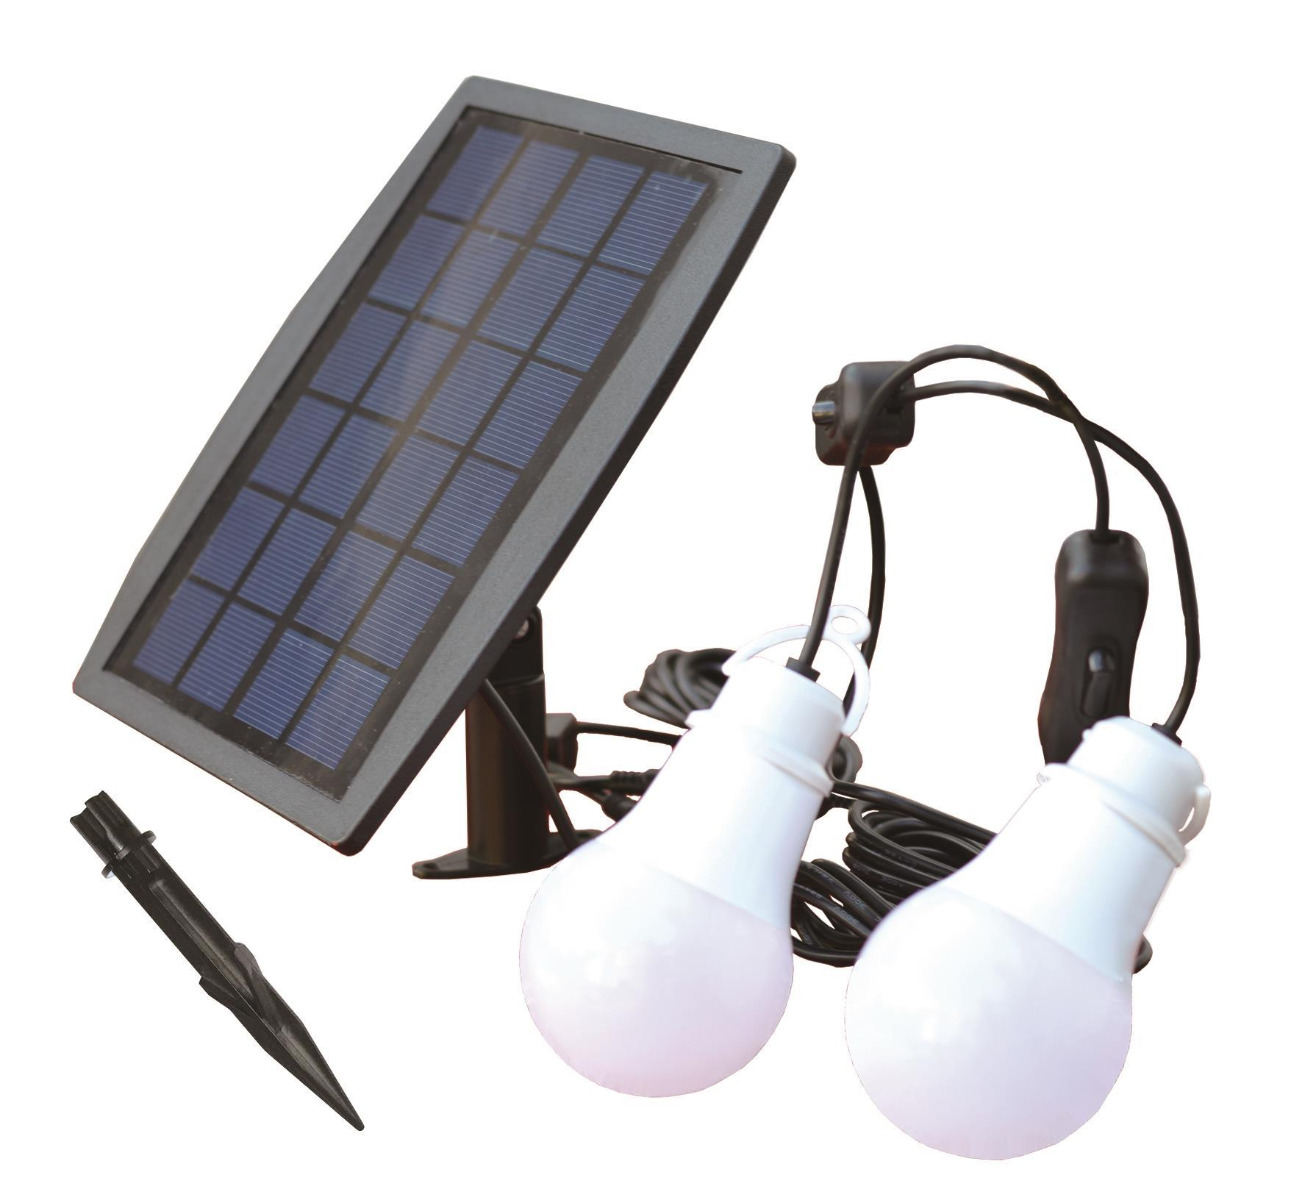 Eurolamp LED Σετ 2 Λαμπτήρων 1.6W με ηλιακό Πάνελ